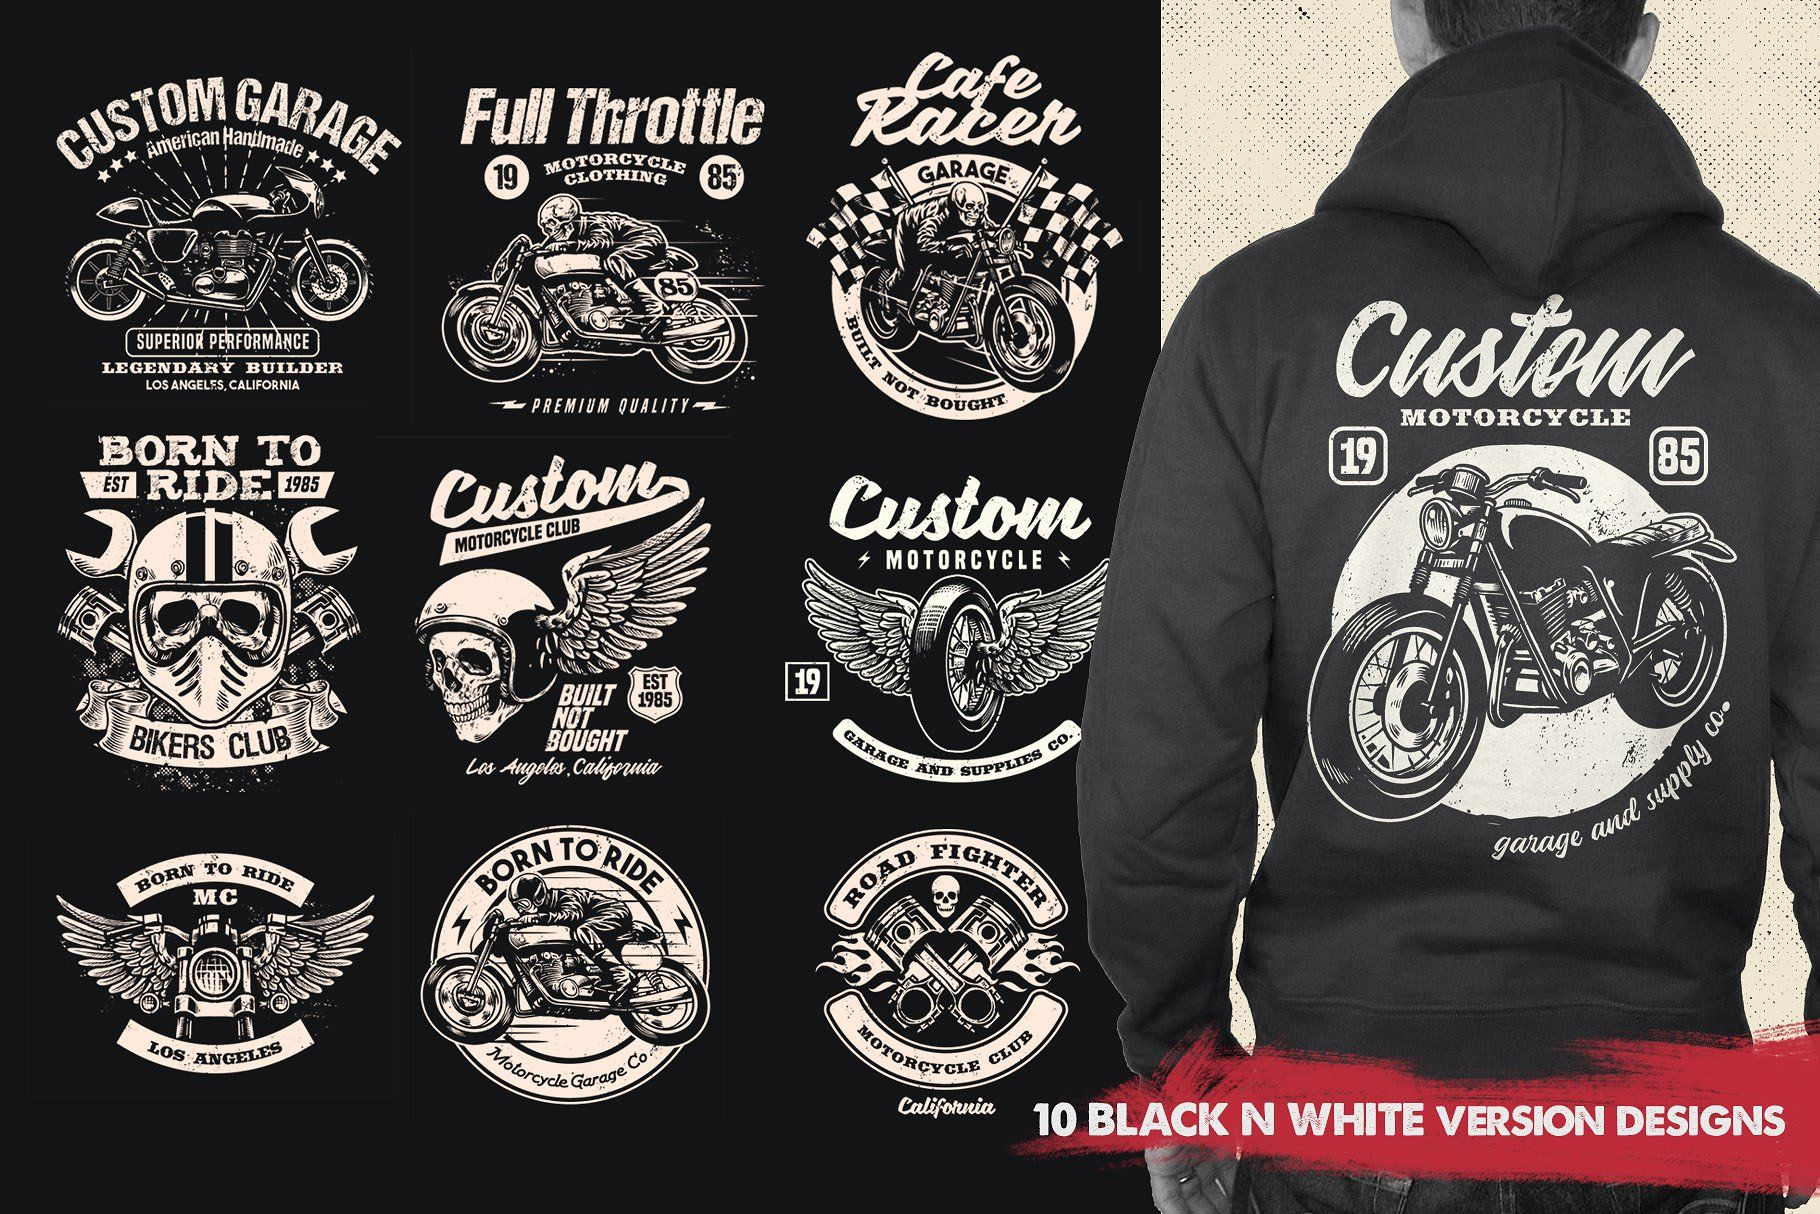 Vintage Motorcycle T Shirt Design Tshirt Designs Motorcycle Tshirts T Shirt Design Vector